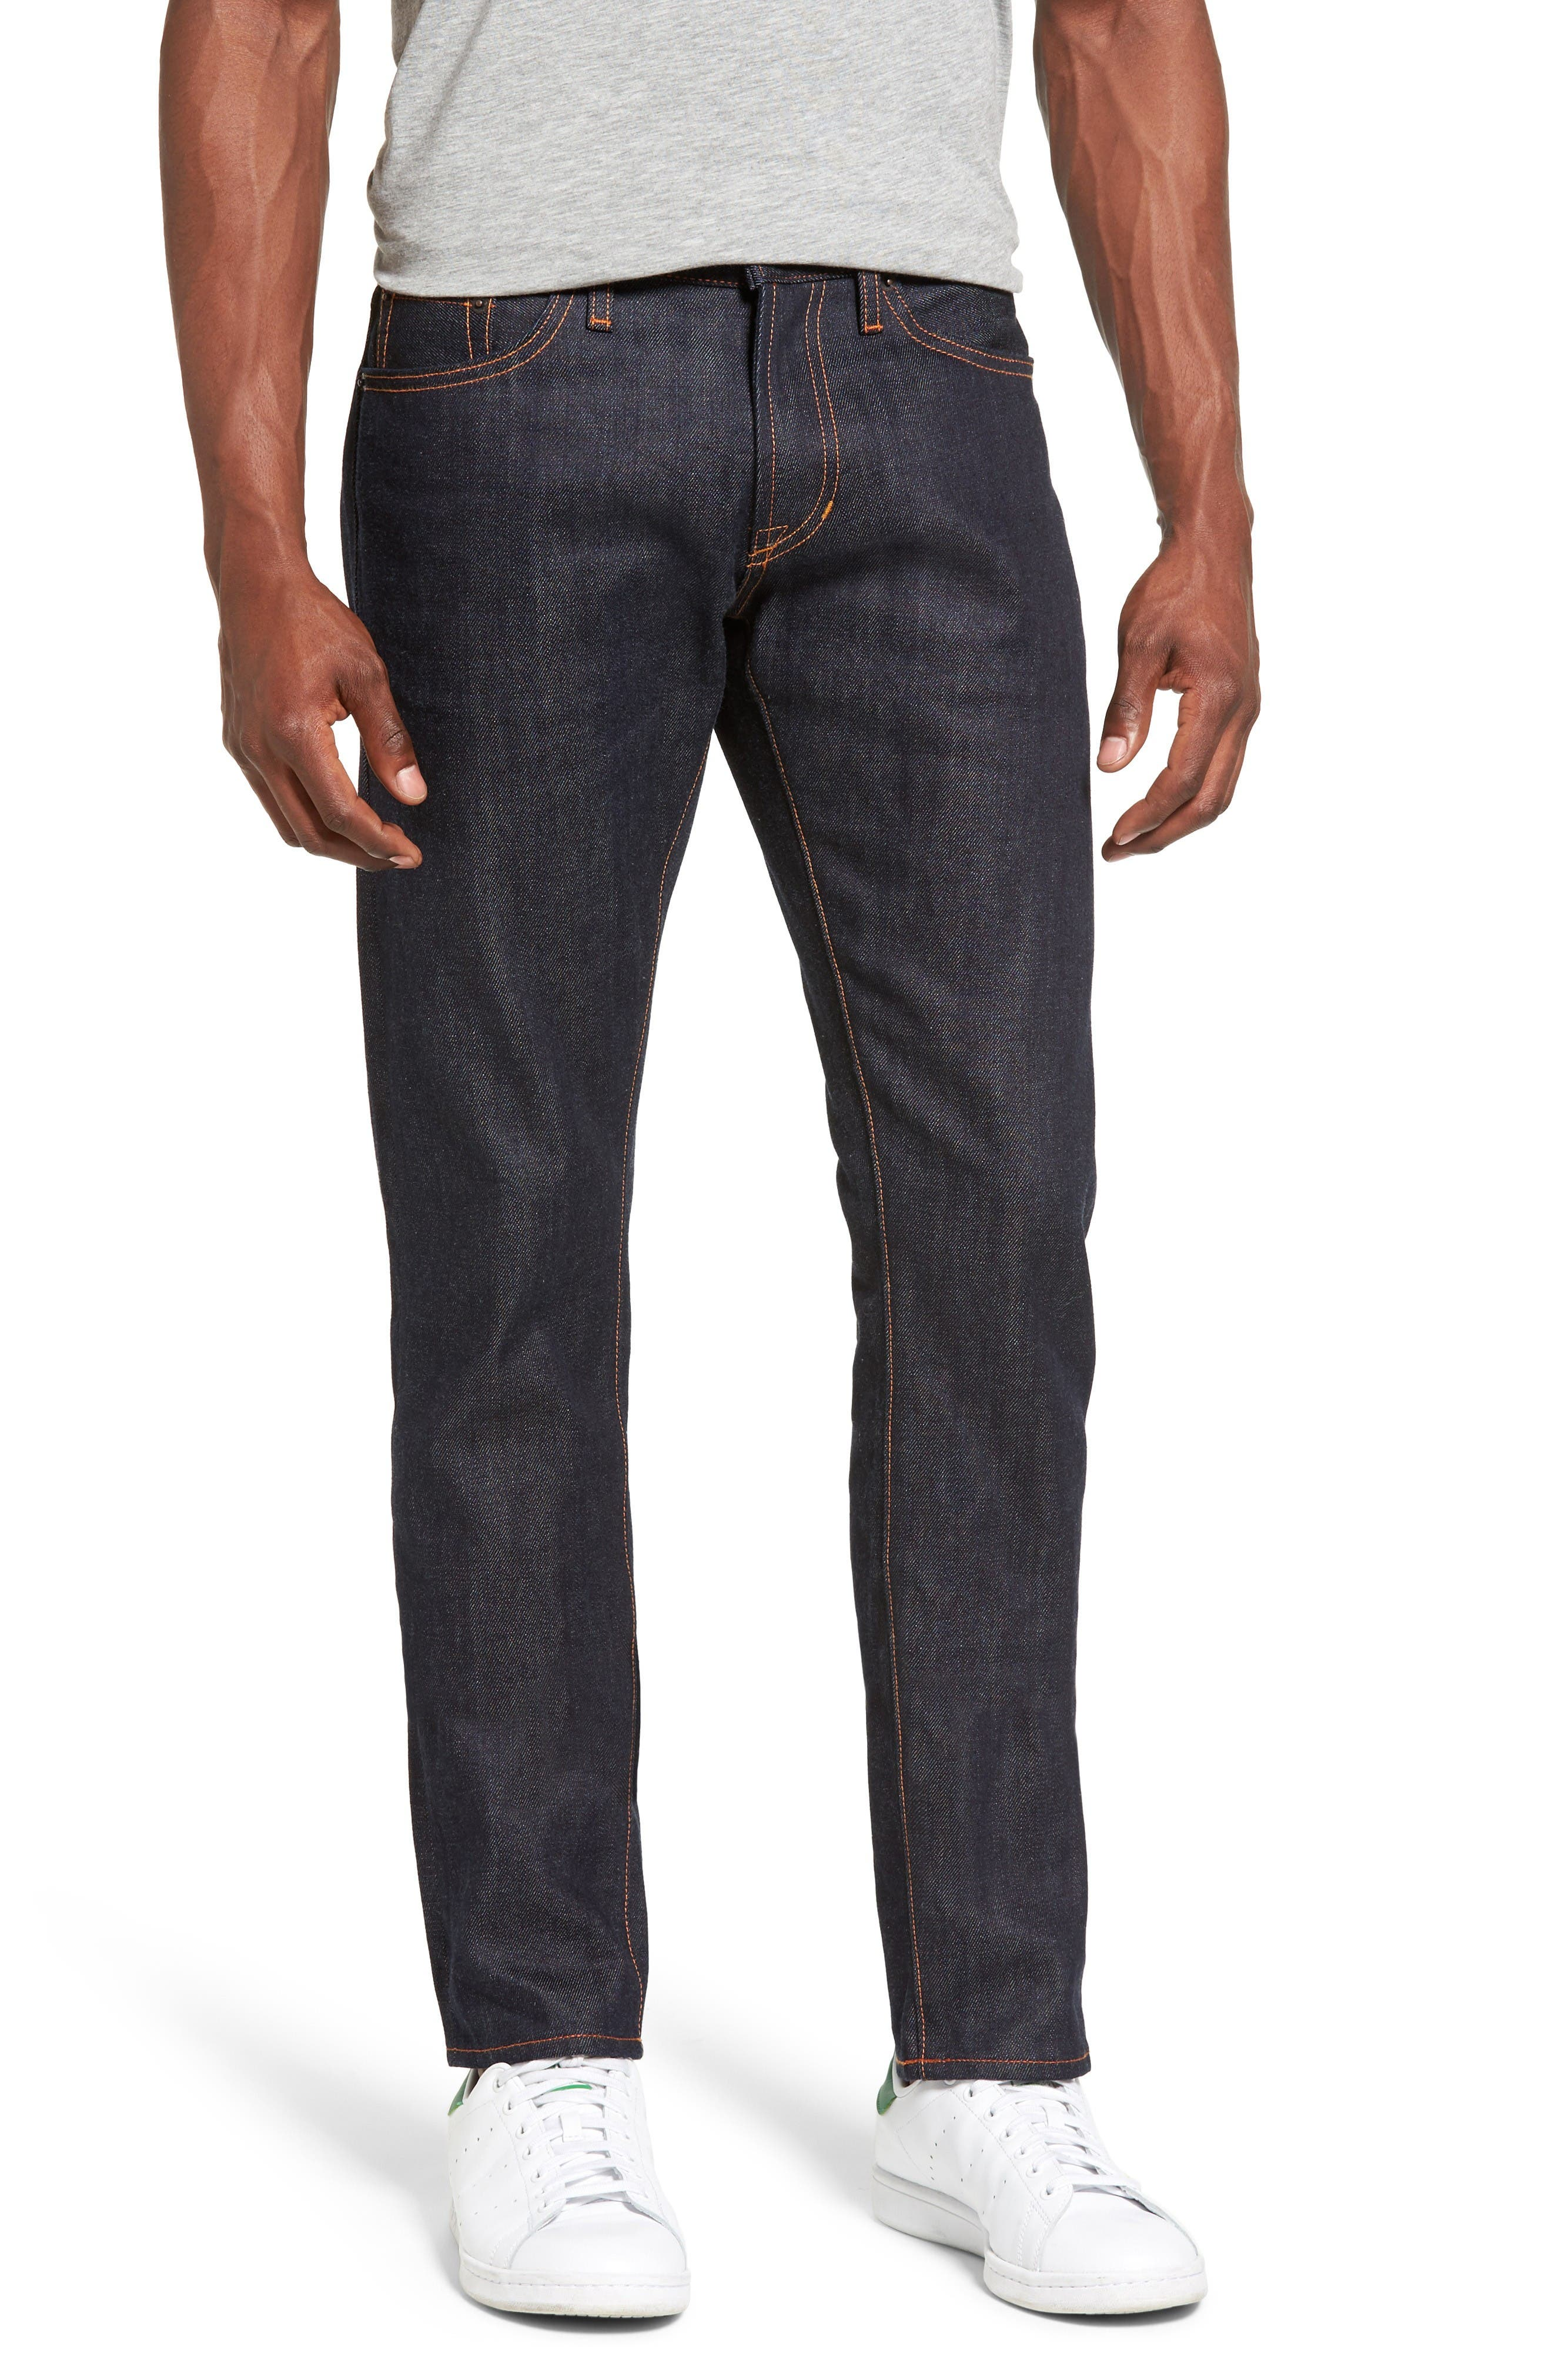 JEAN SHOP Jim Slim Fit Raw Selvedge Jeans